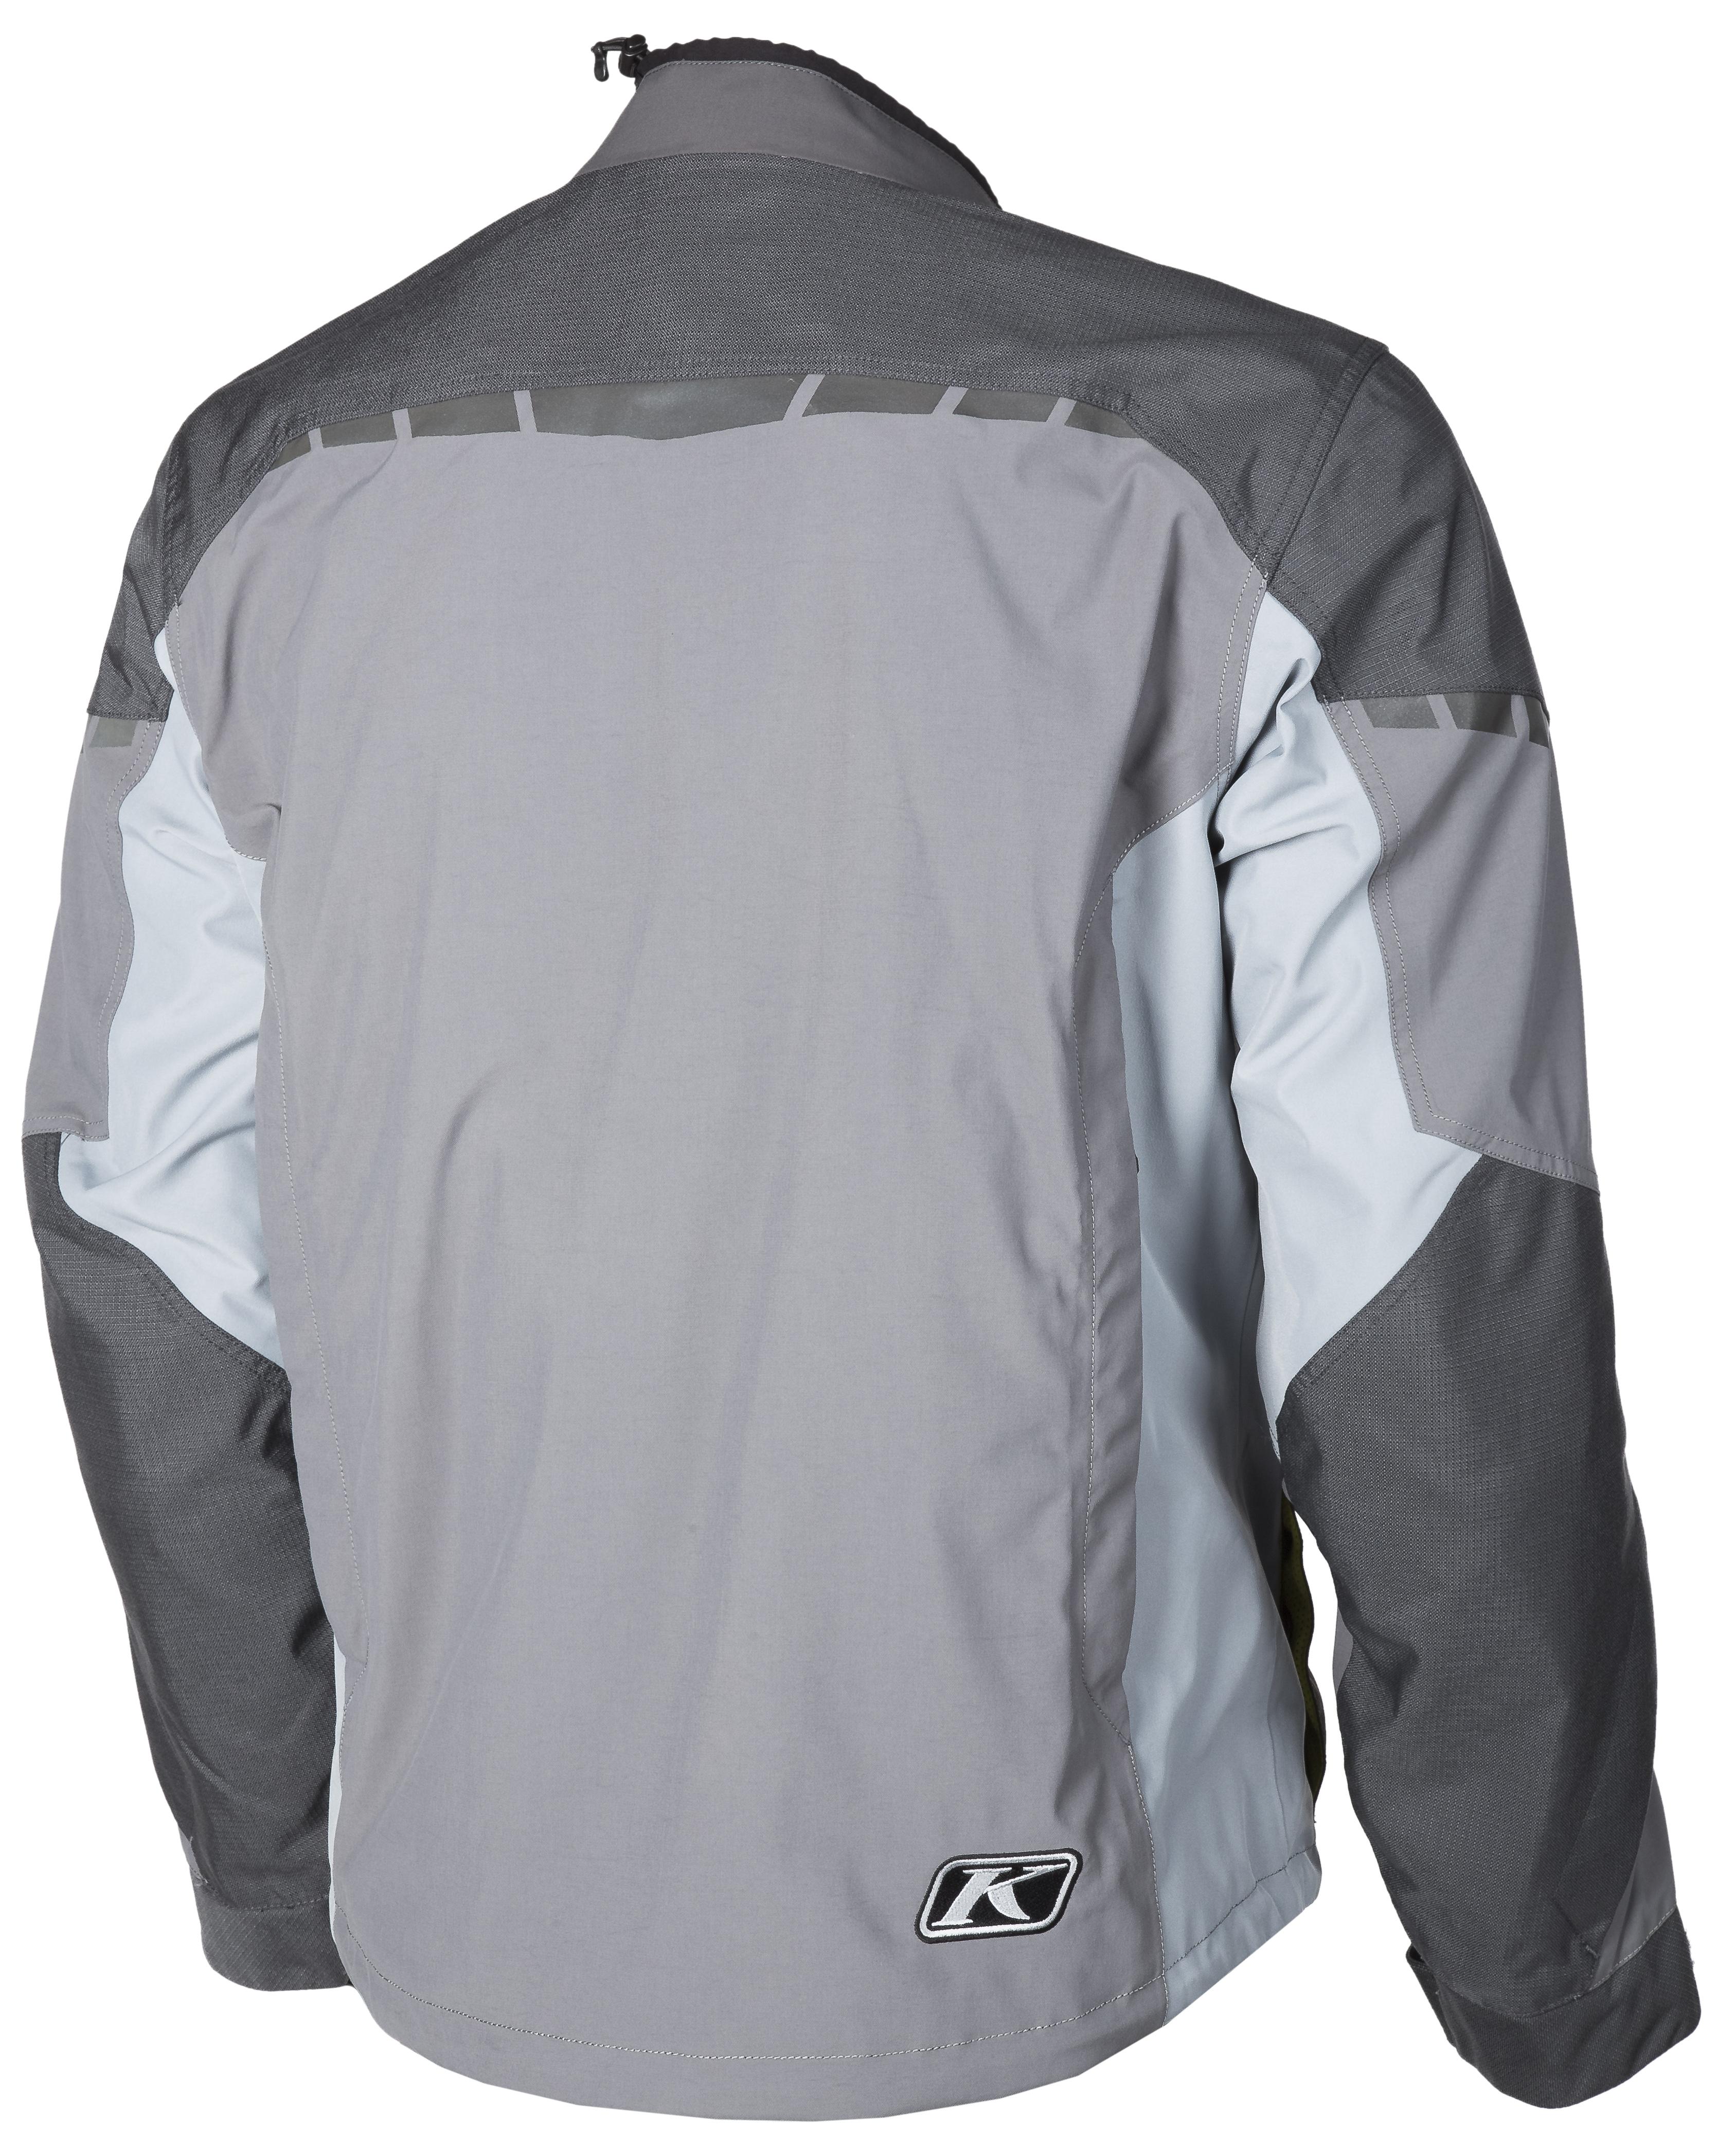 3906-000-600 Carlsbad Jacket D1